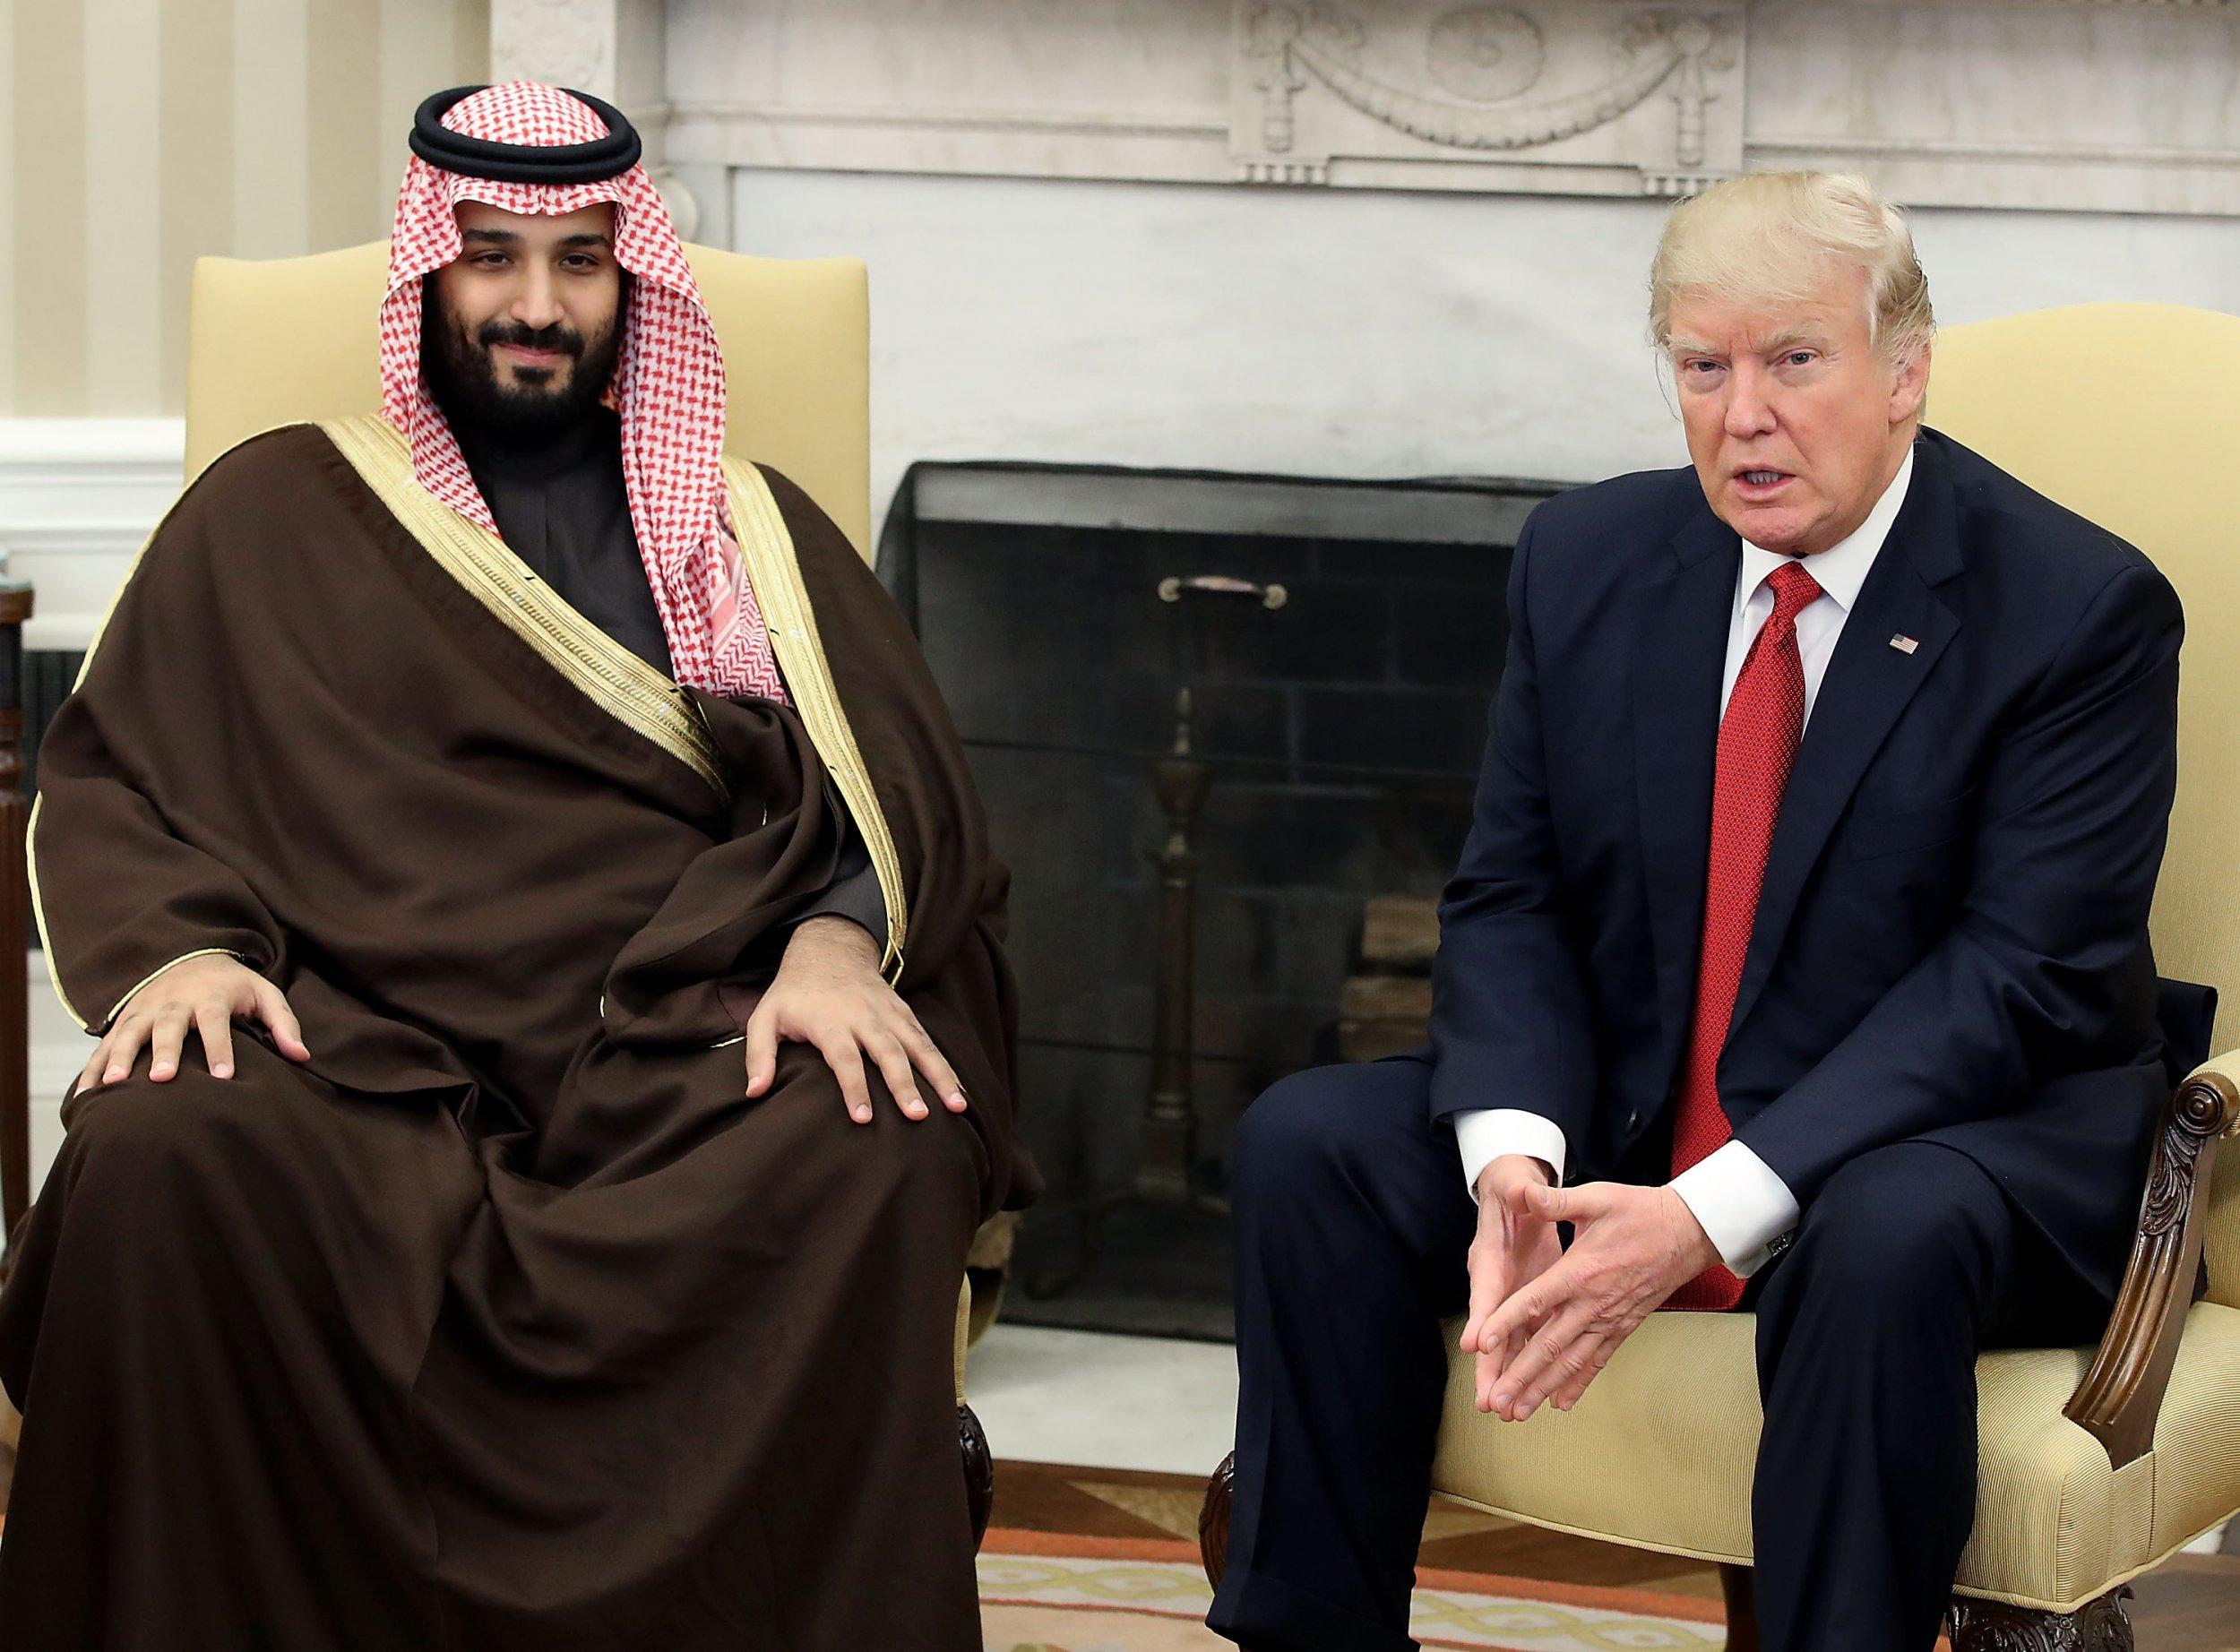 Trump Mohammed bin Salman